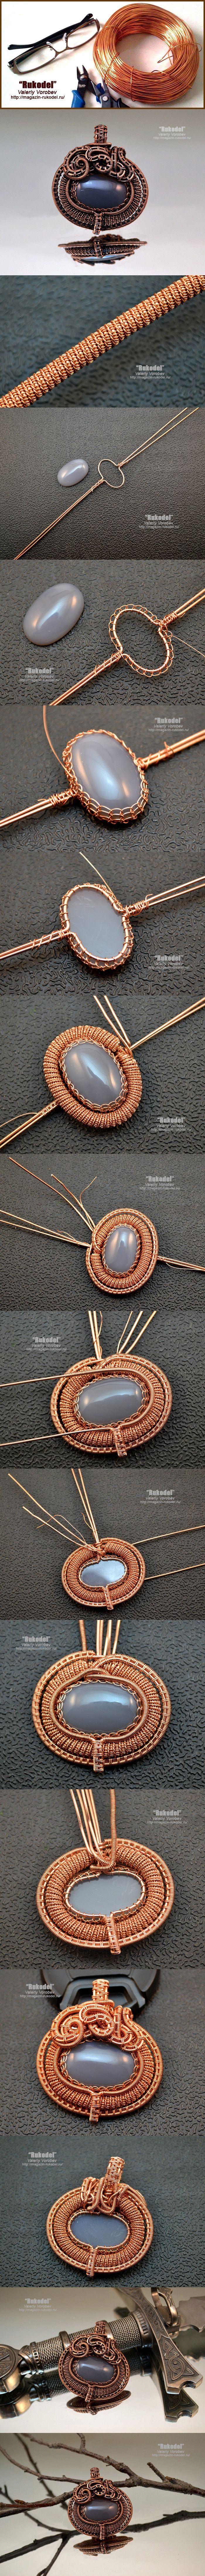 Wire wrap tutorial on Vorobev. Wire Wrap Pendant.  #rukodel, #Vorobev, #handmade, #wirewrap, #wirejewelry, #wirewrapped, #Jewelry, #tutorial, #WireWrapping